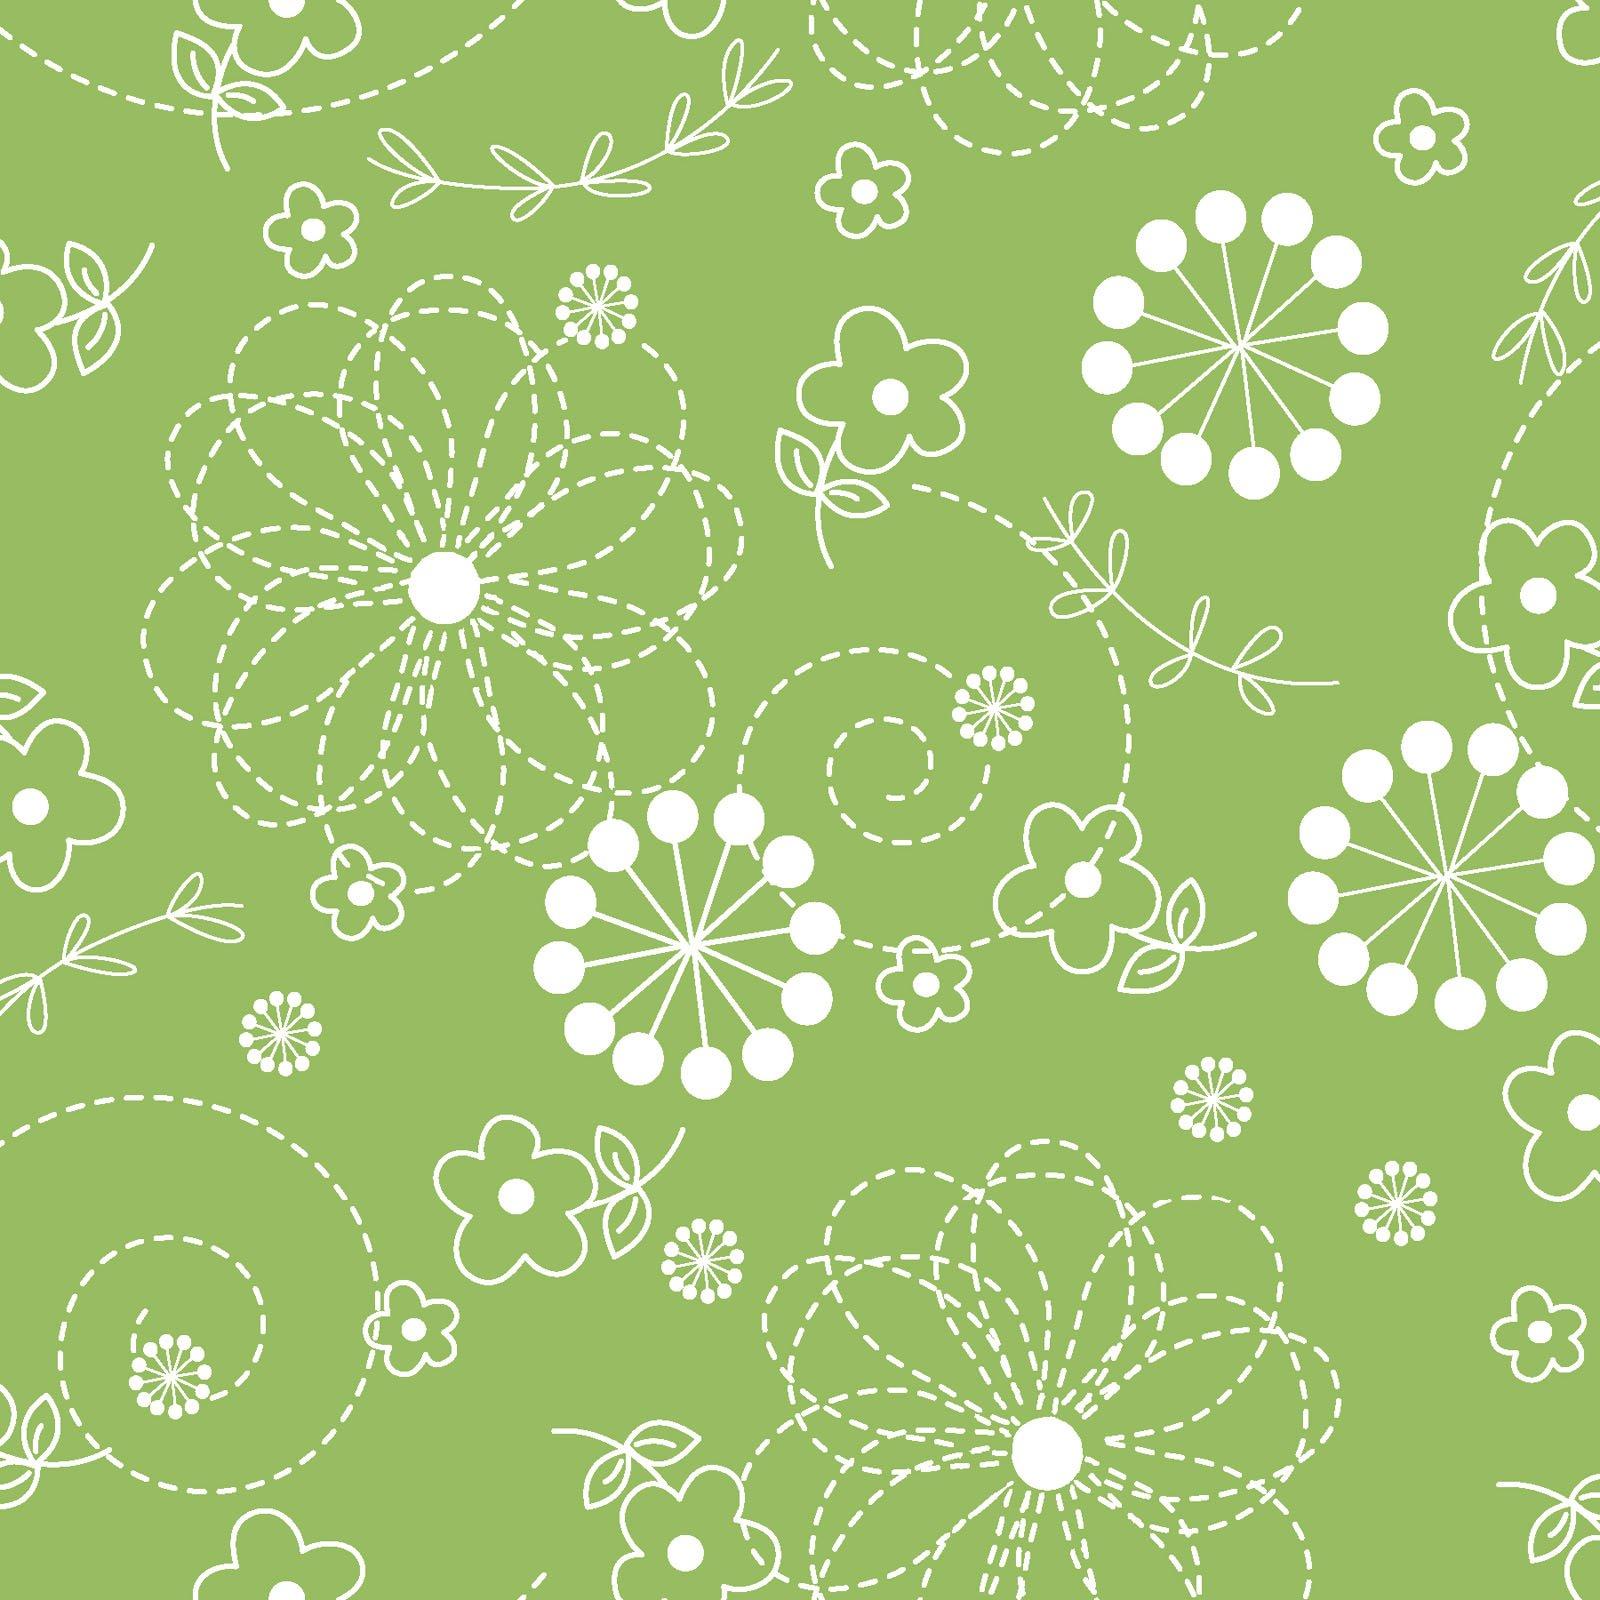 KimberBell Basics Green Doodles 8246M-G